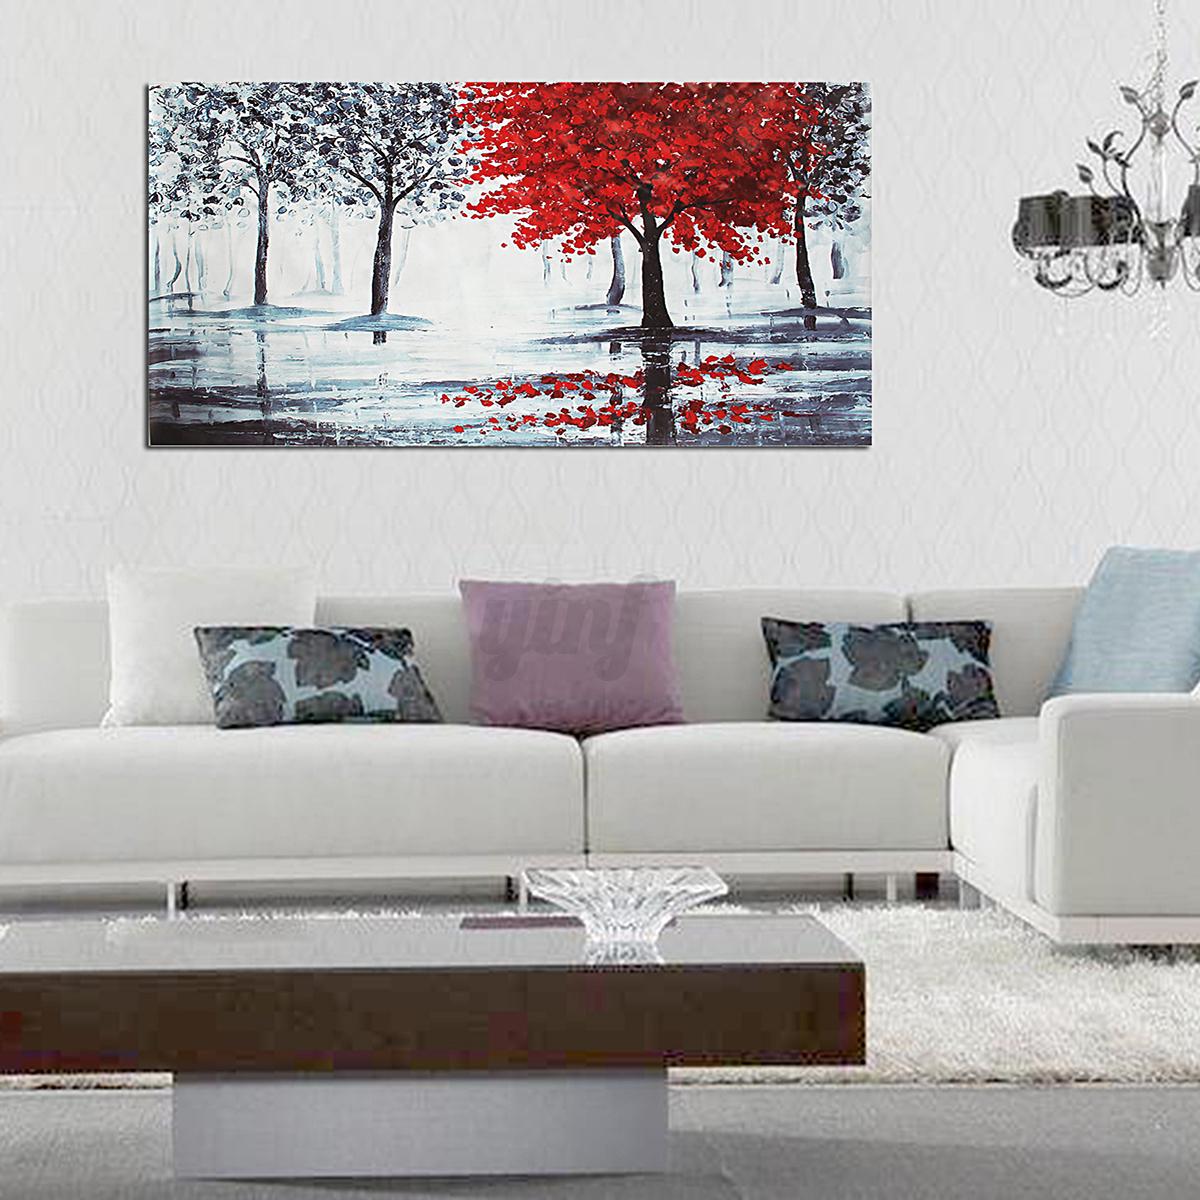 Impresi n sin enmarcar moderno abstracto lienzo pintura - Enmarcar lienzo ...